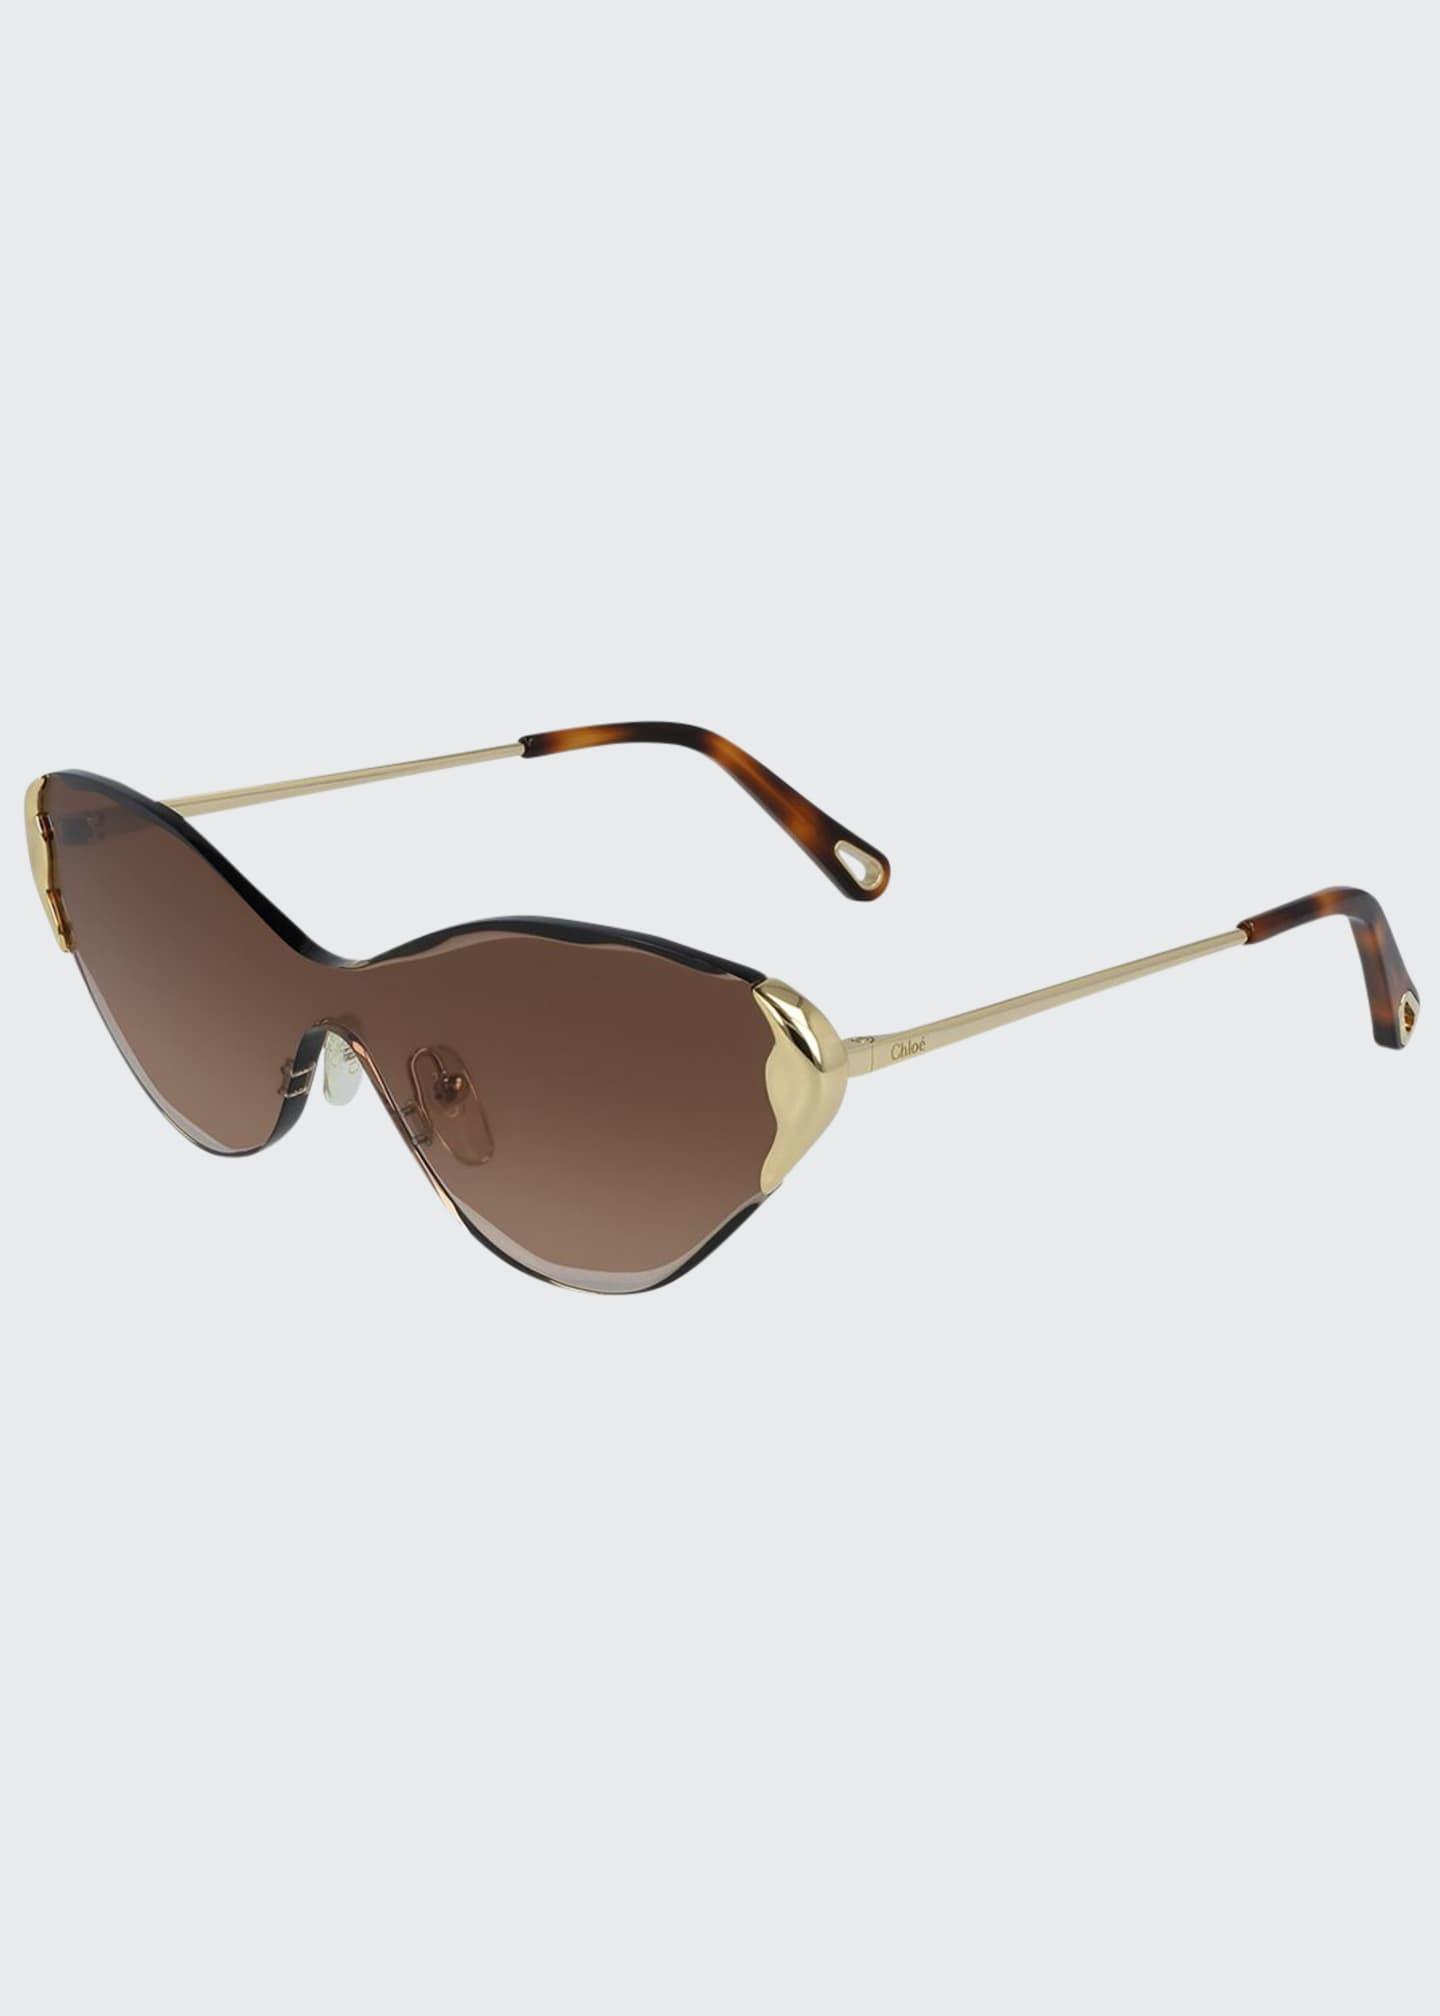 Chloe Rimless Cat-Eye Shield Sunglasses